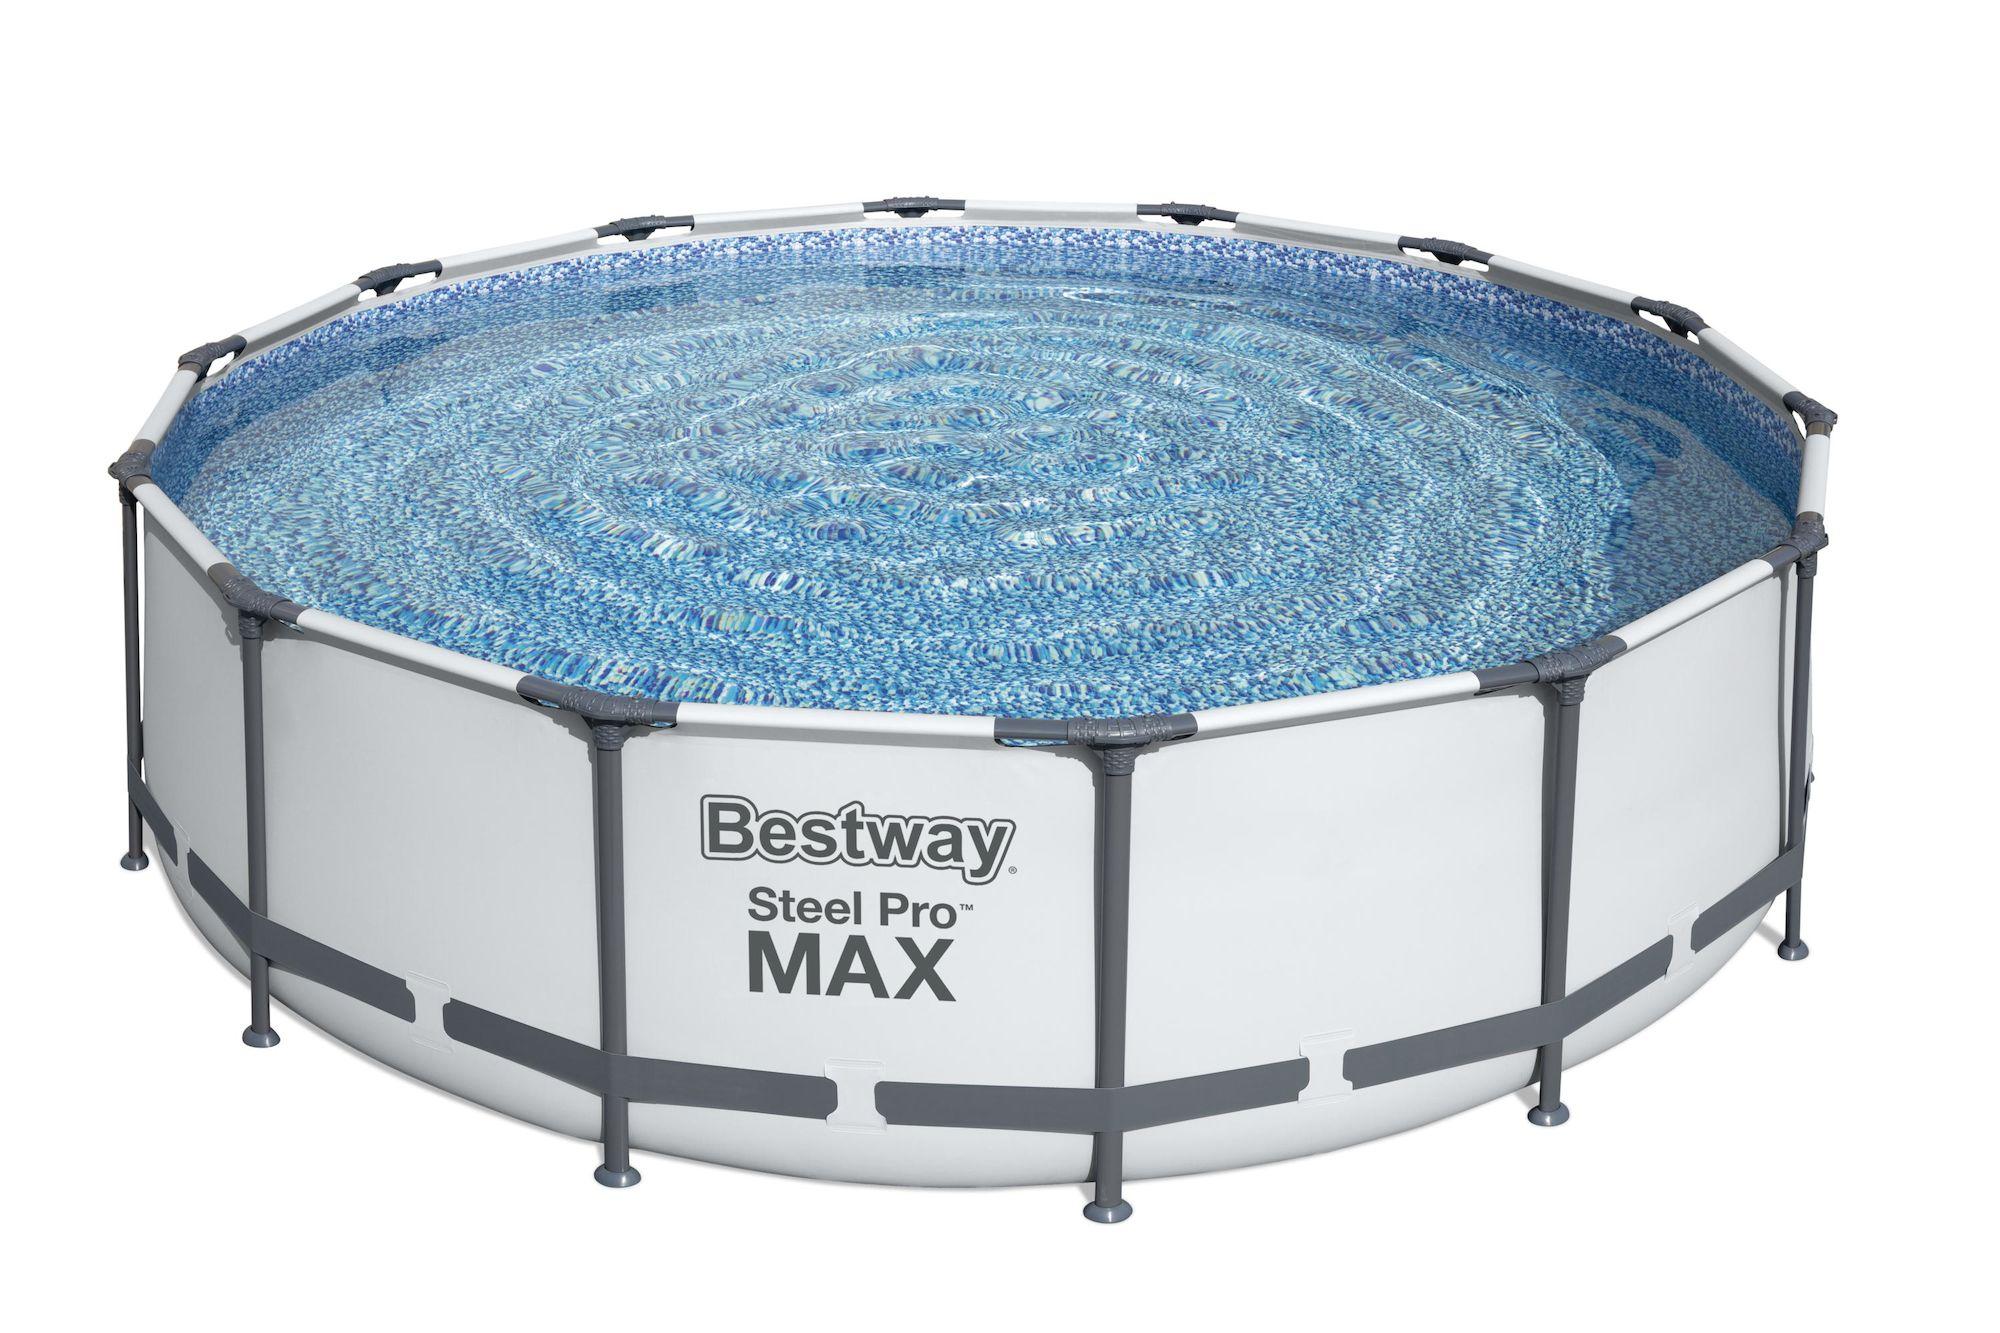 Bestway Steel Pro MAX Pool m. Tillbehör 4.27m x 1.07m